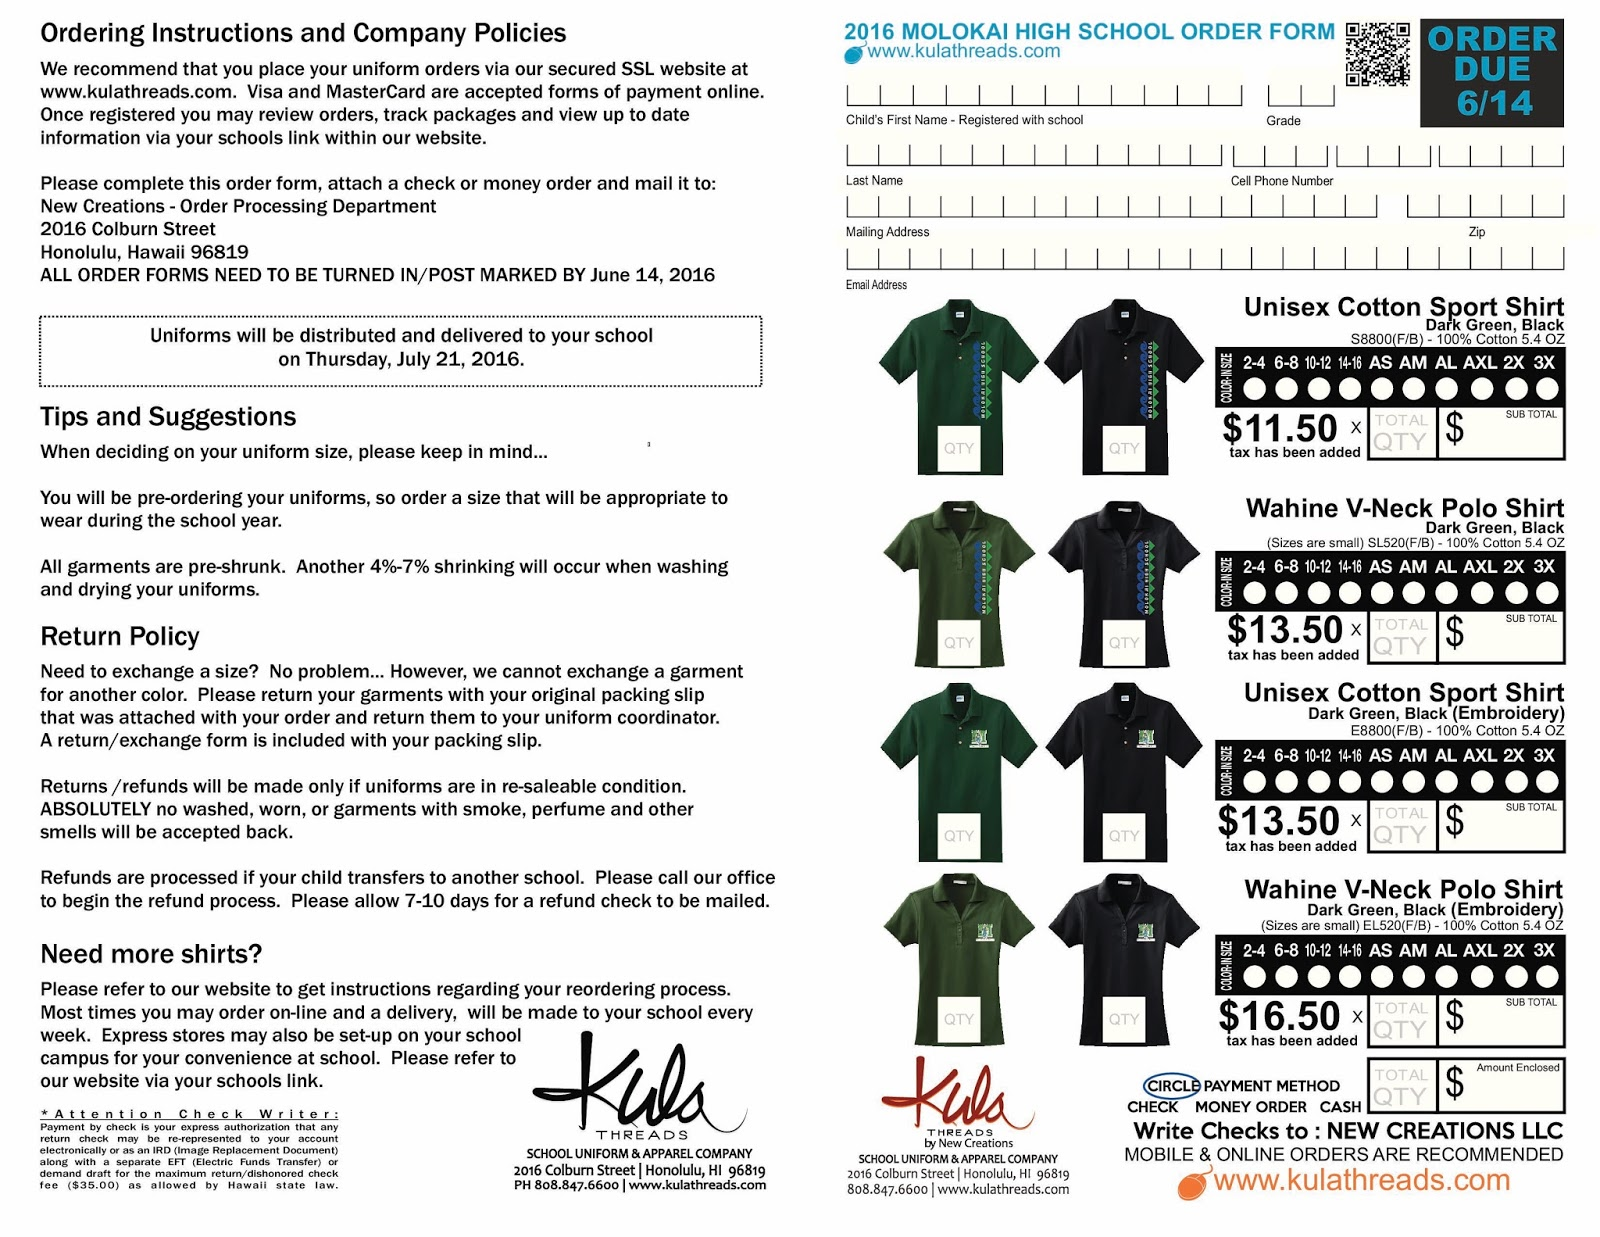 Molokai High School Notifications Uniform Policy Letter